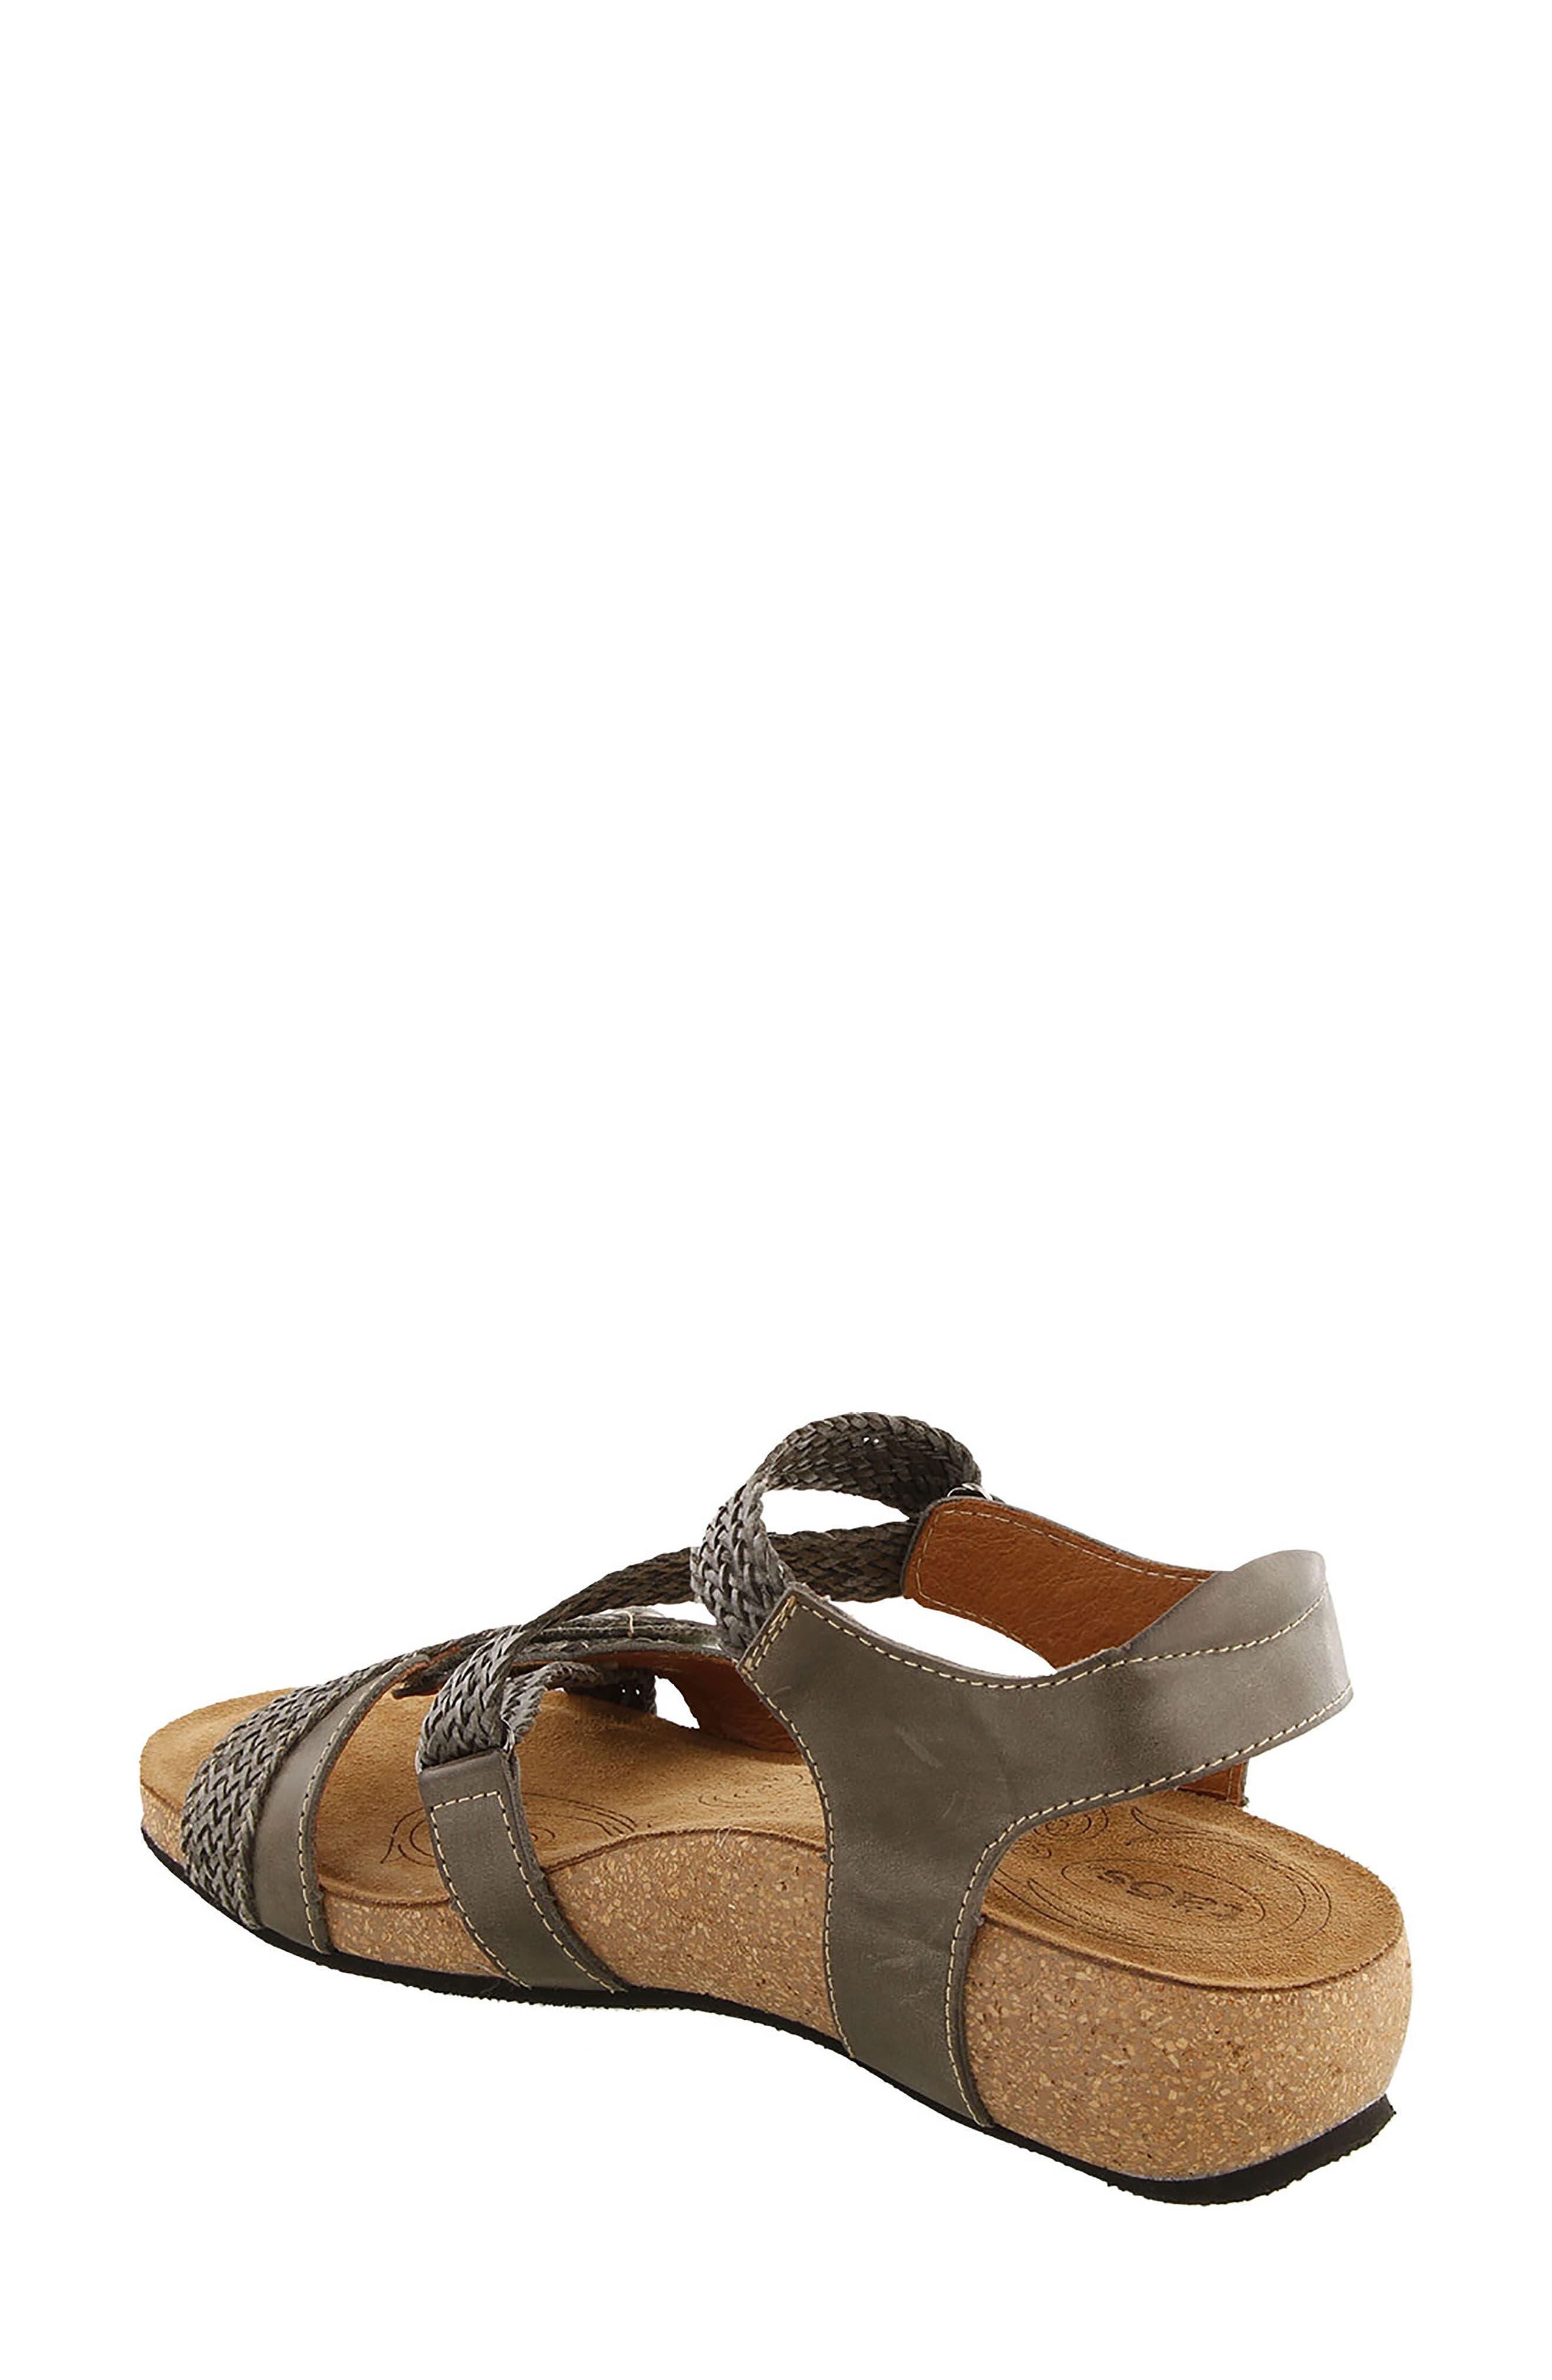 TAOS,                             'Trulie' Wedge Sandal,                             Alternate thumbnail 2, color,                             022